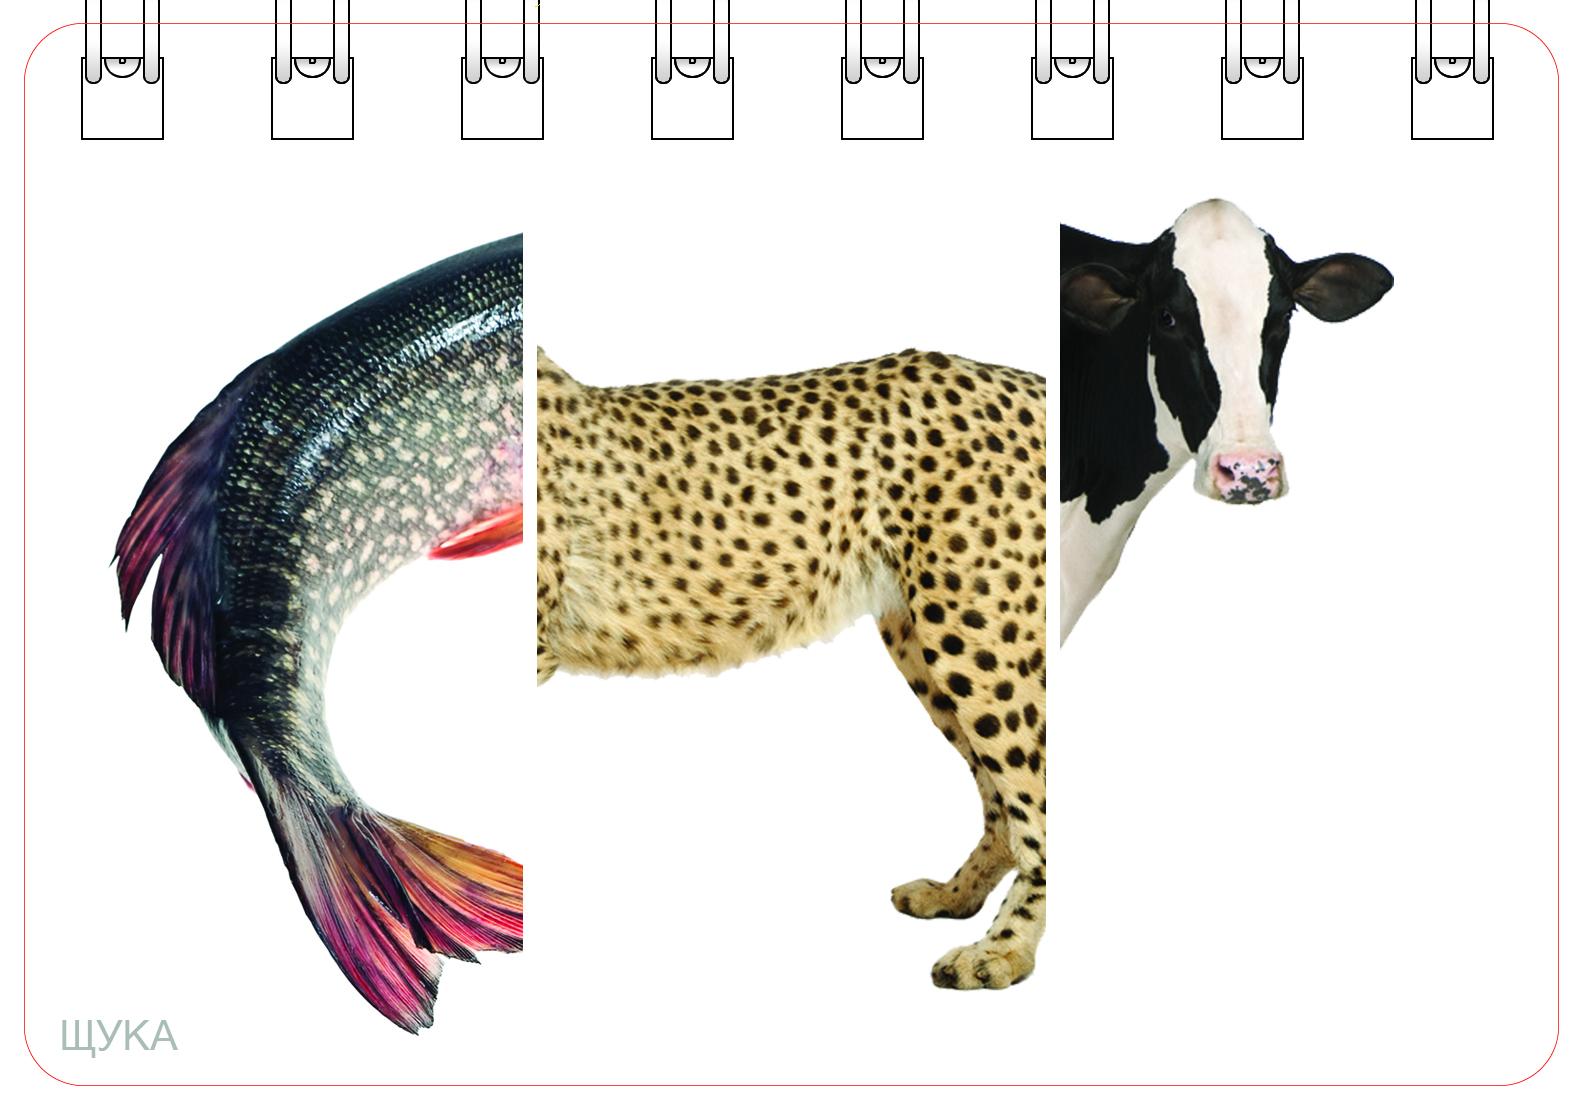 Части тела животного в картинках для ребенка